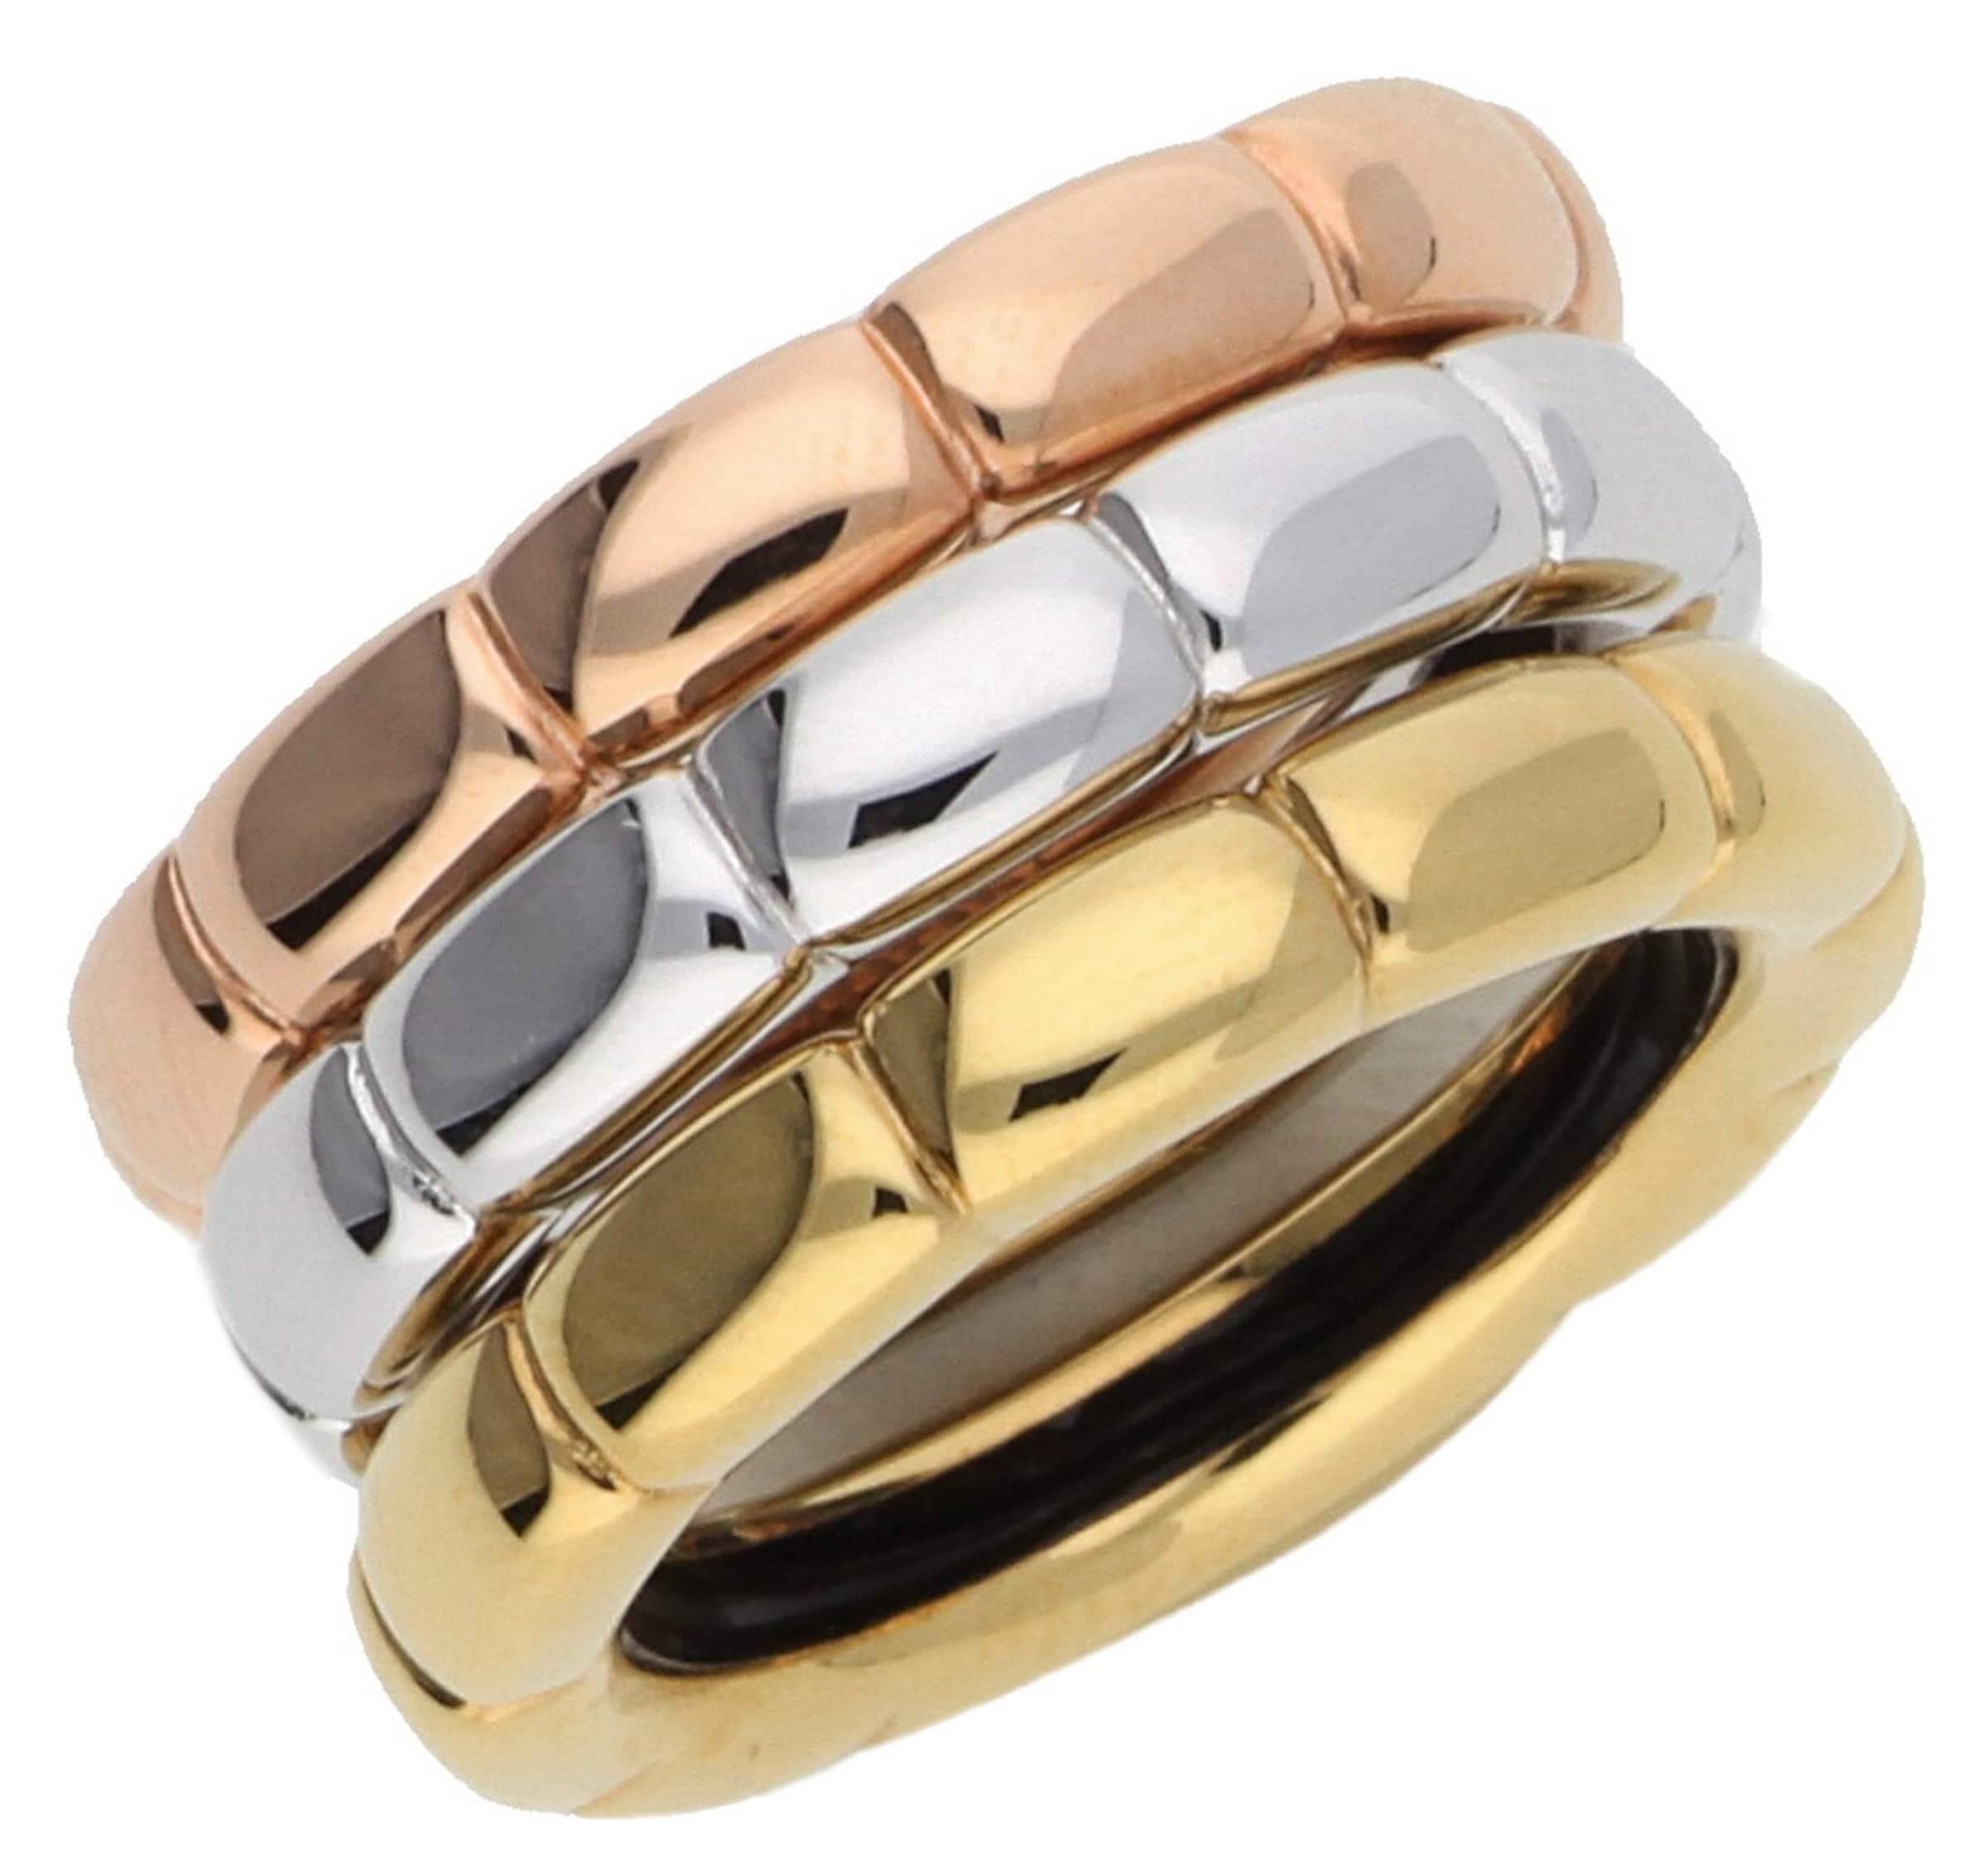 JOOP! Damen Fingerring Silber Gold Lia JPRG90729A Billiges Outlet-Store ugQWY